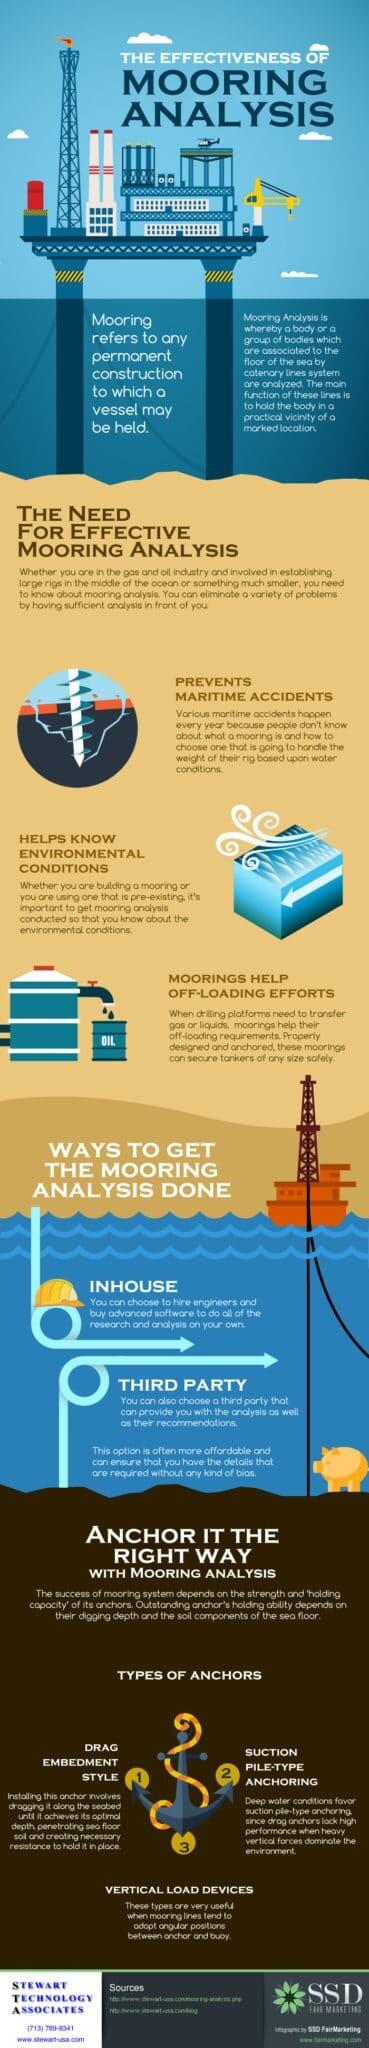 mooring-analysis-infographic-september-2014